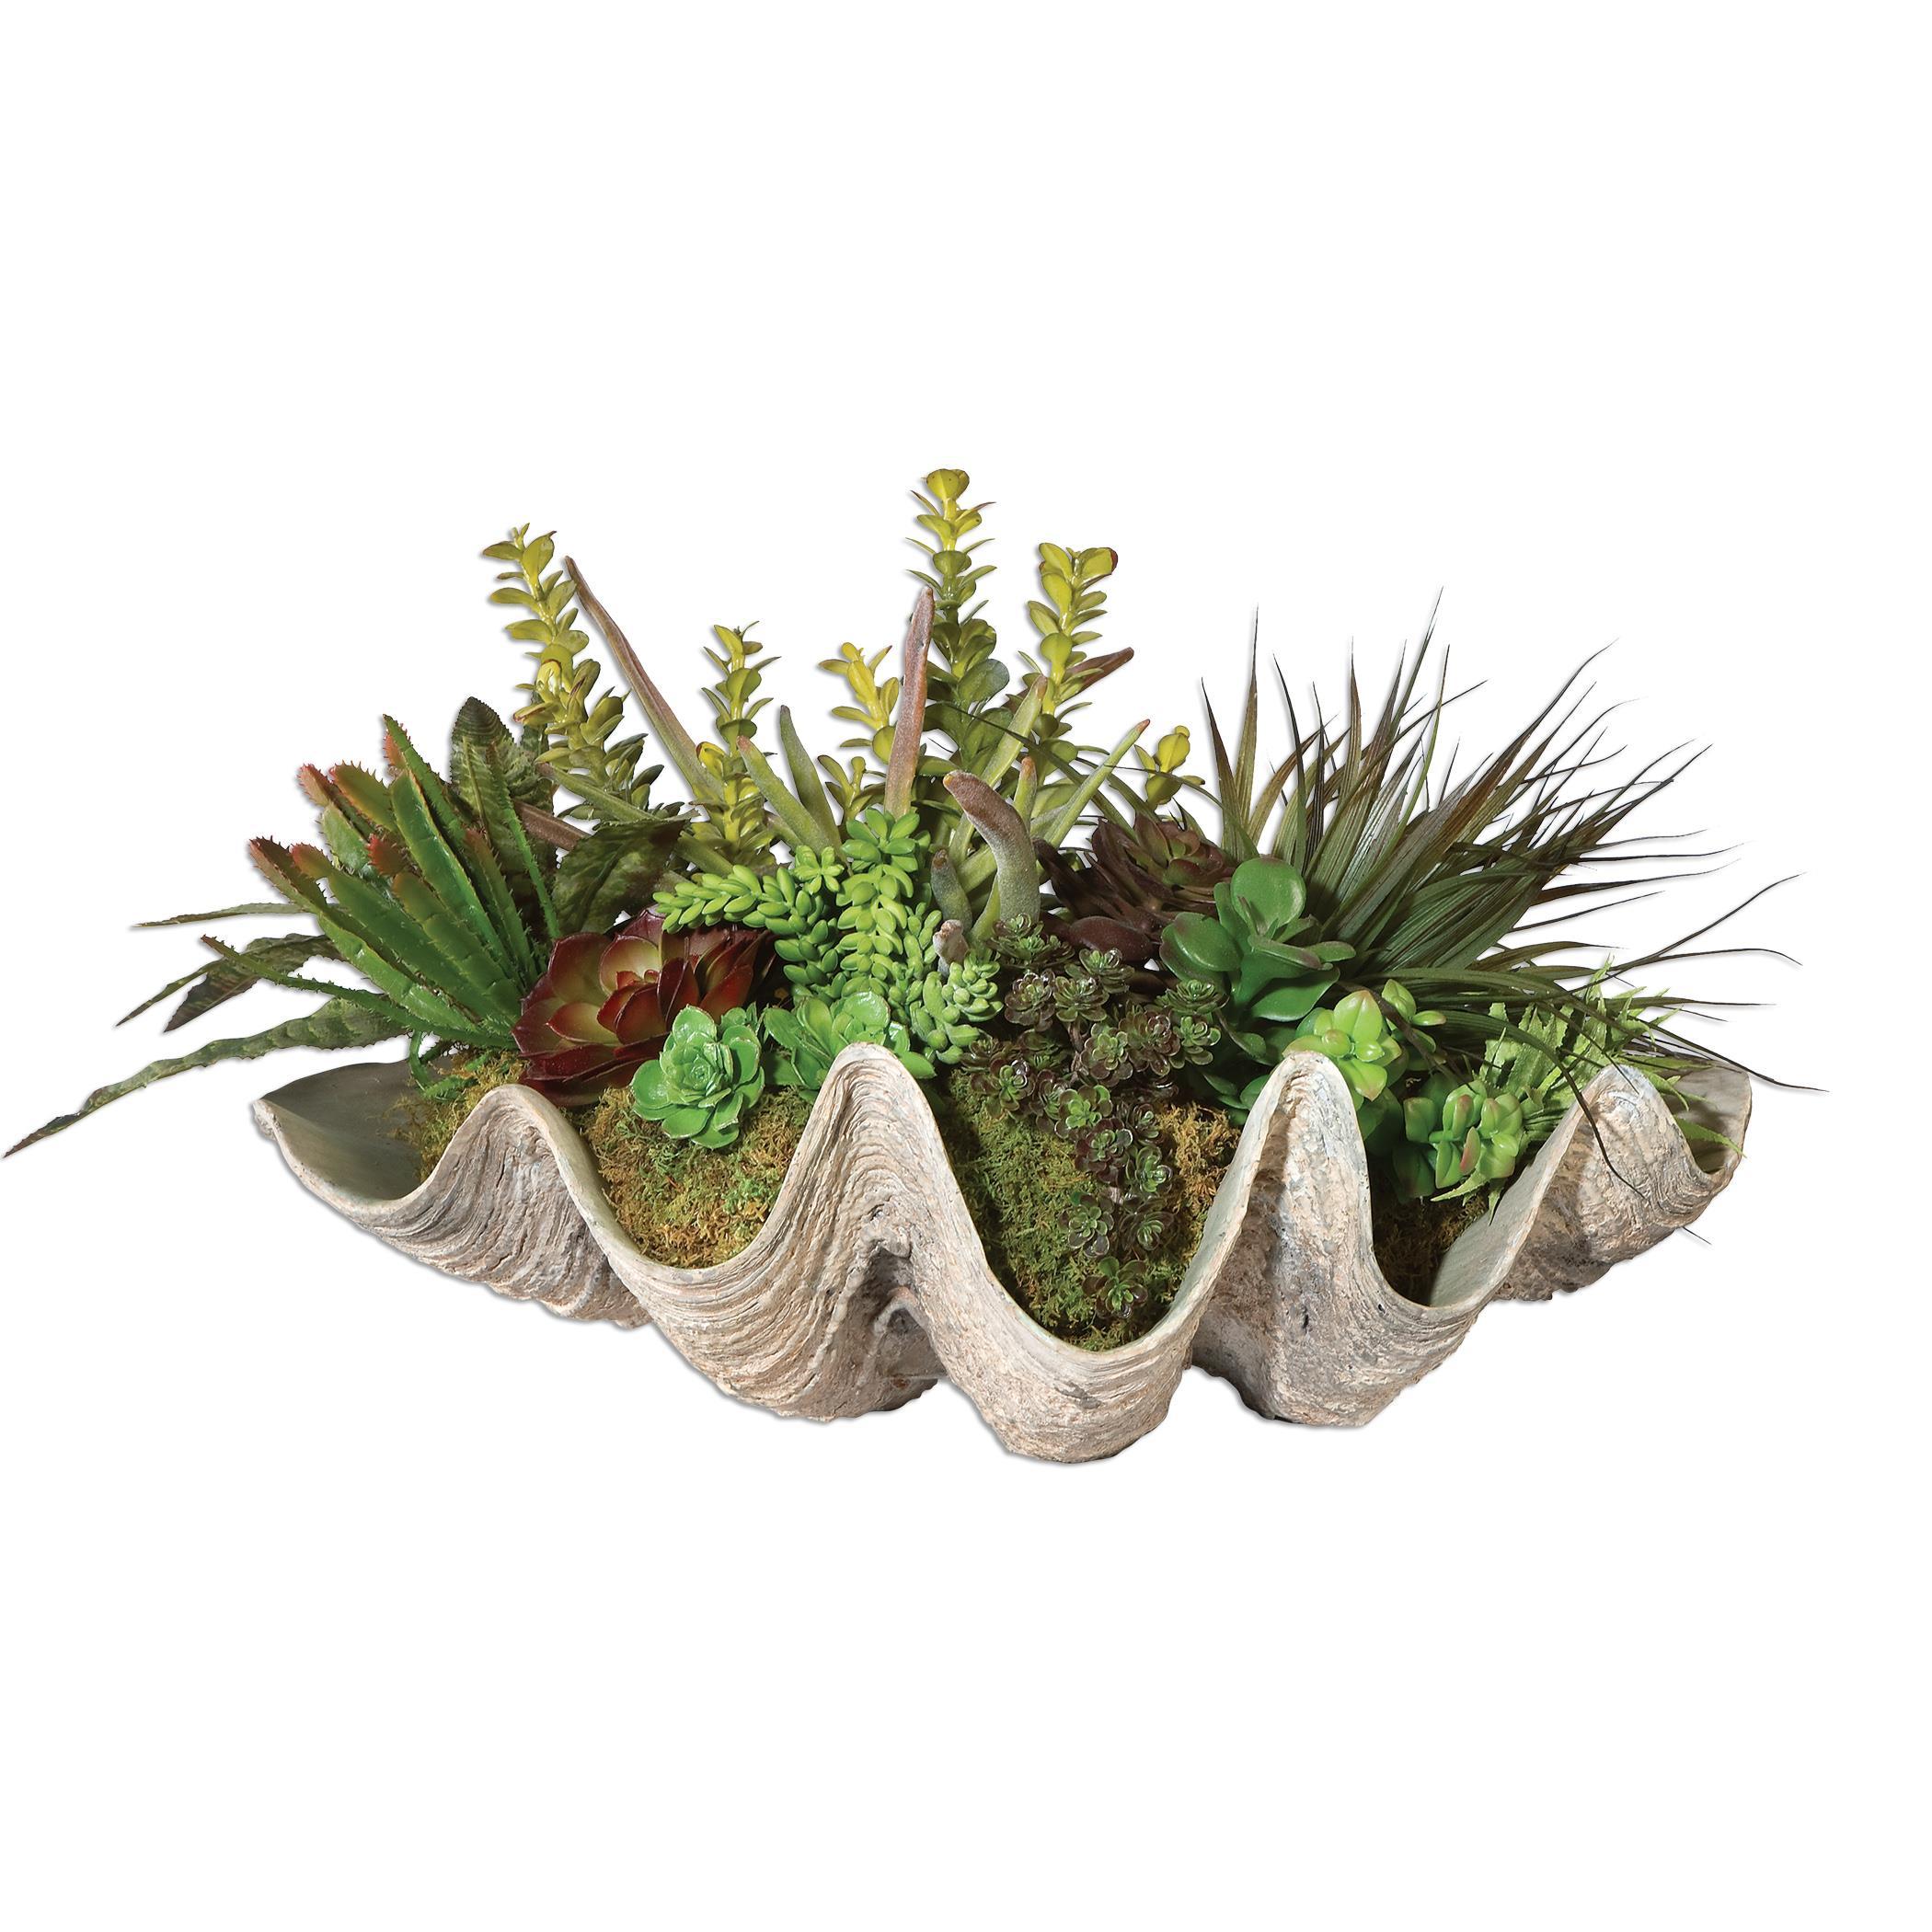 Uttermost Accessories Sea Coast Succulents - Item Number: 60116